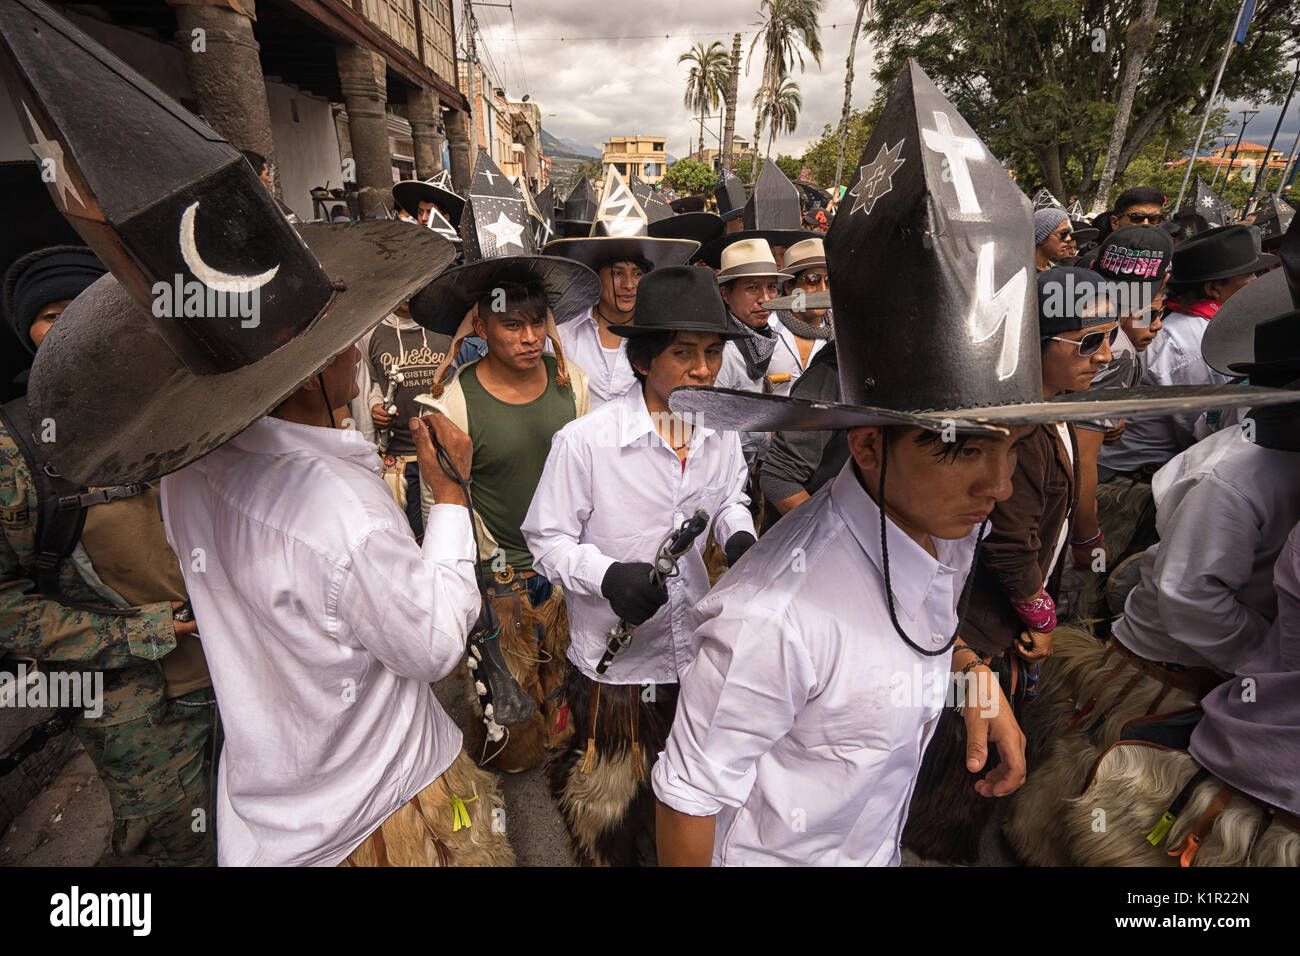 June 24, 2017 Cotacachi, Ecuador: indigenous kichwa men participating in a parade at summer solstice - Stock Image